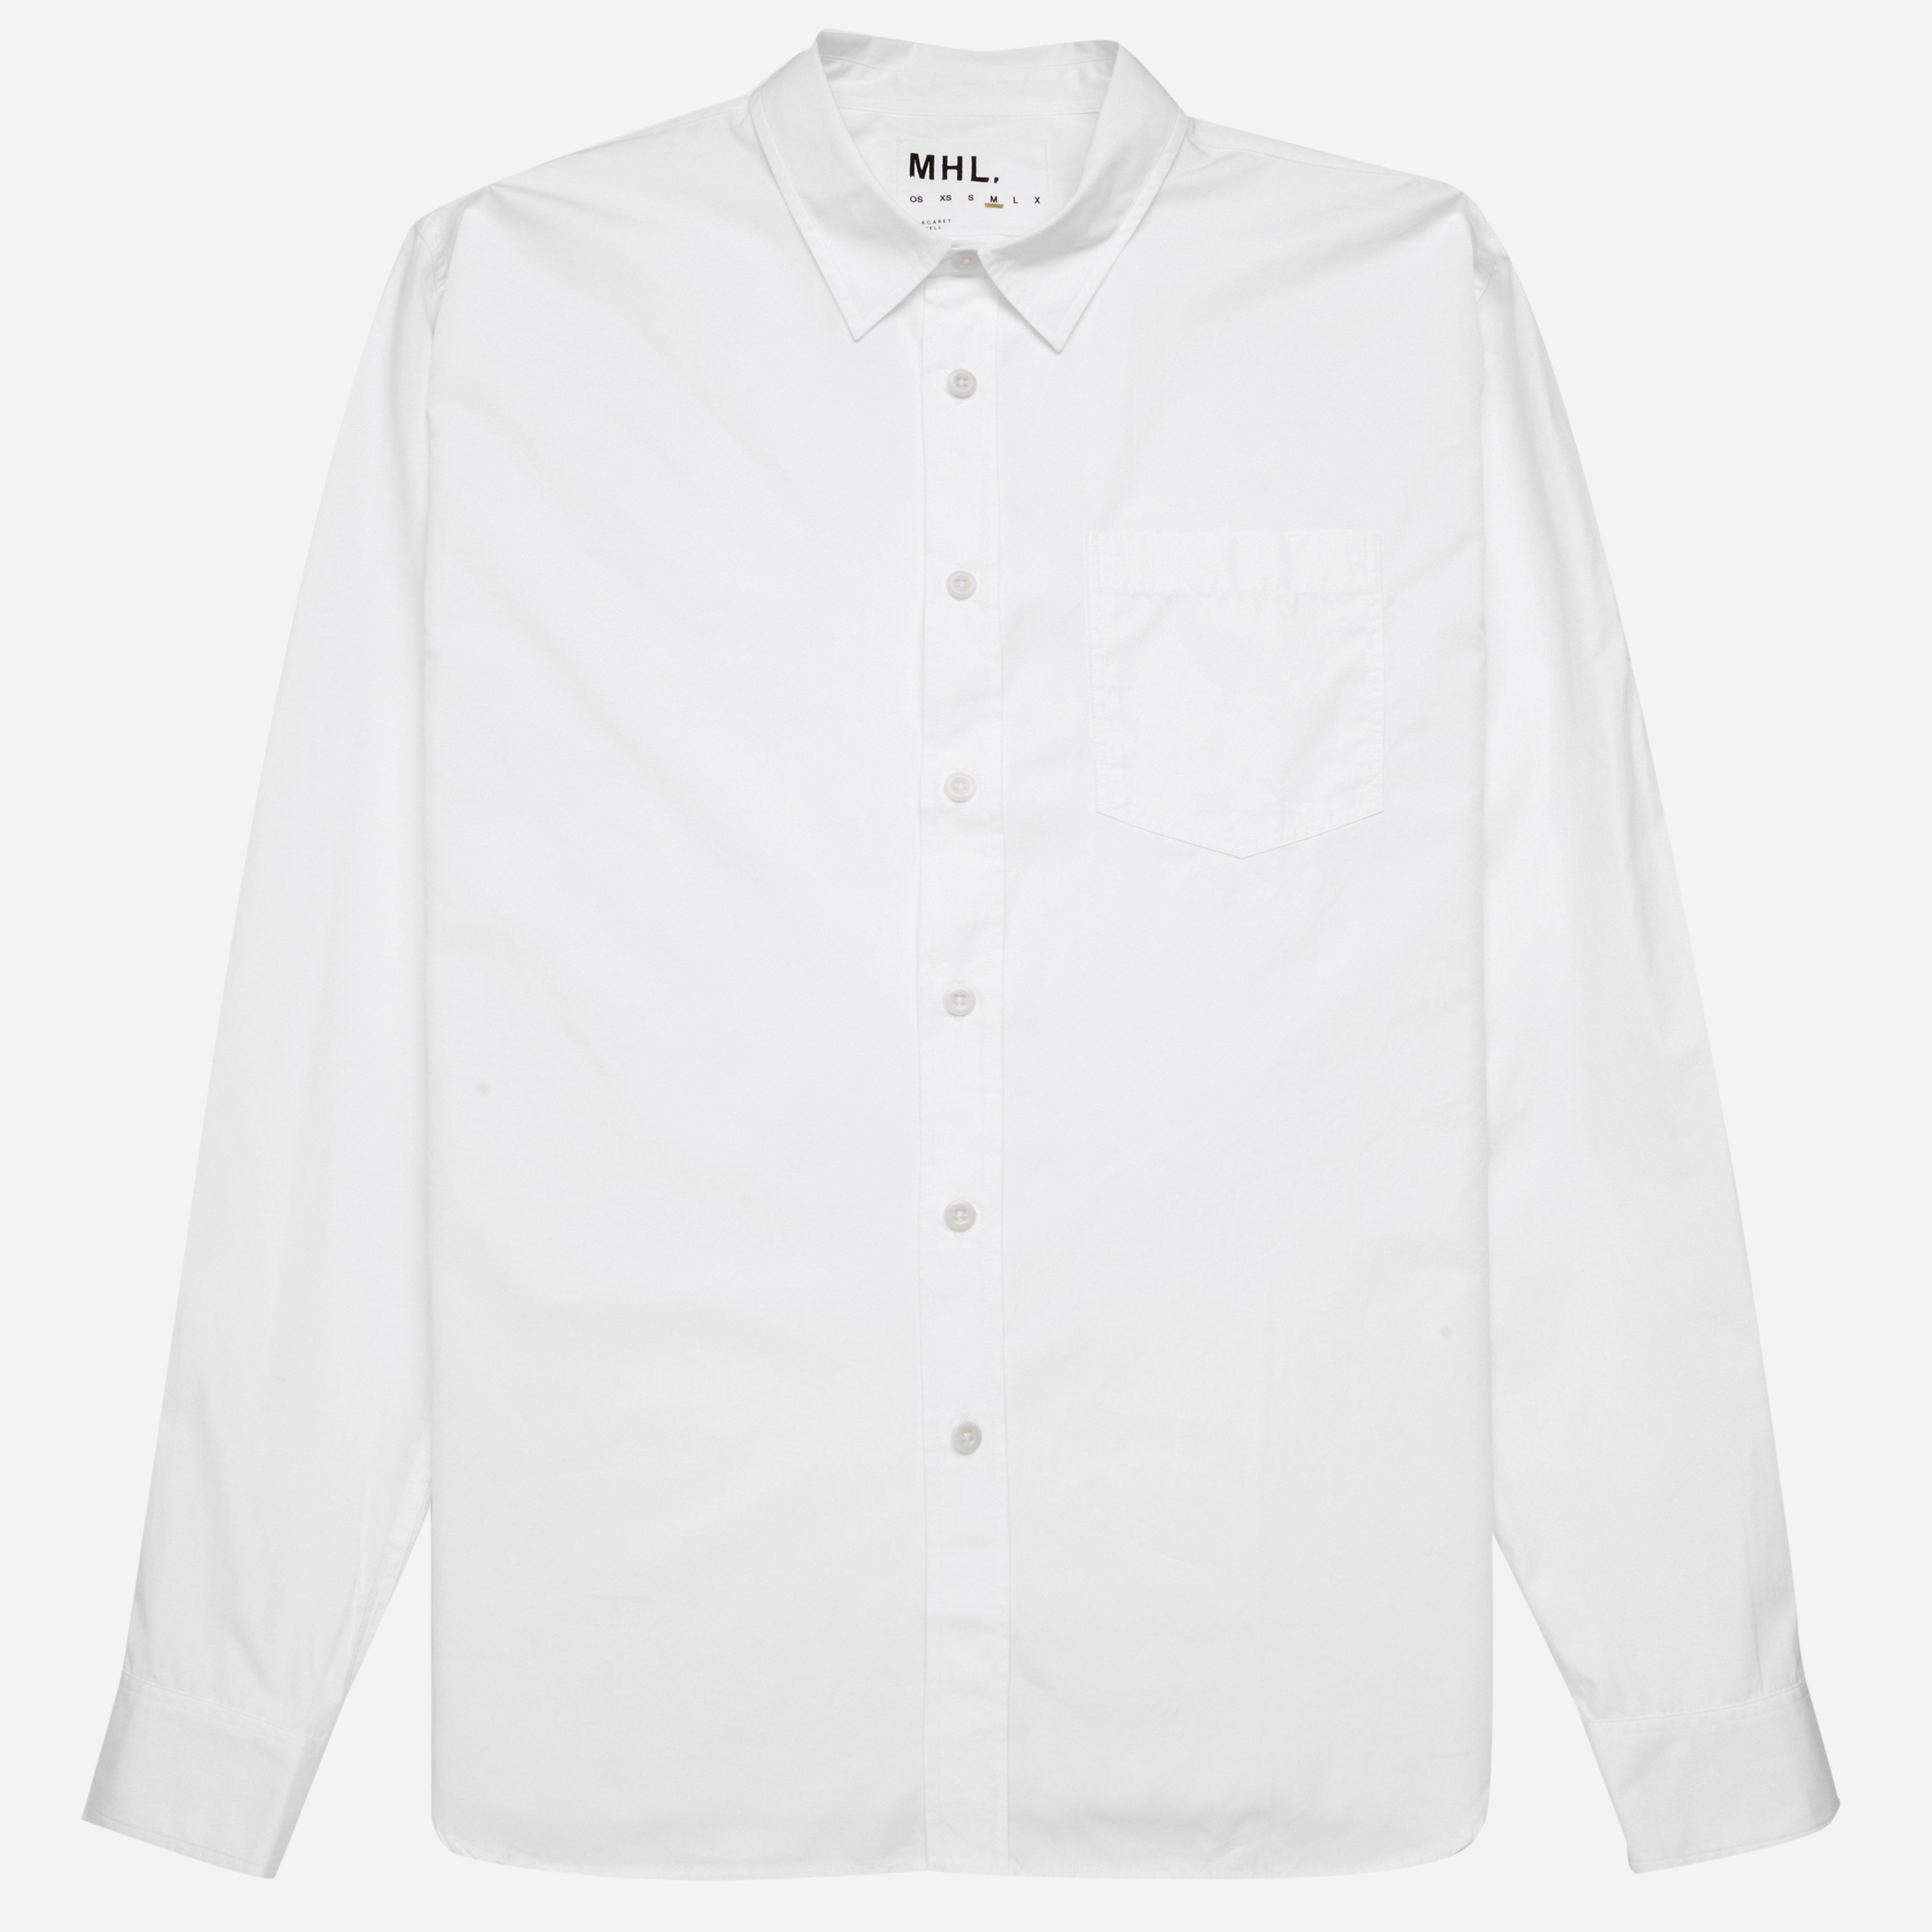 MHL Basic Cotton Poplin Compact Shirt